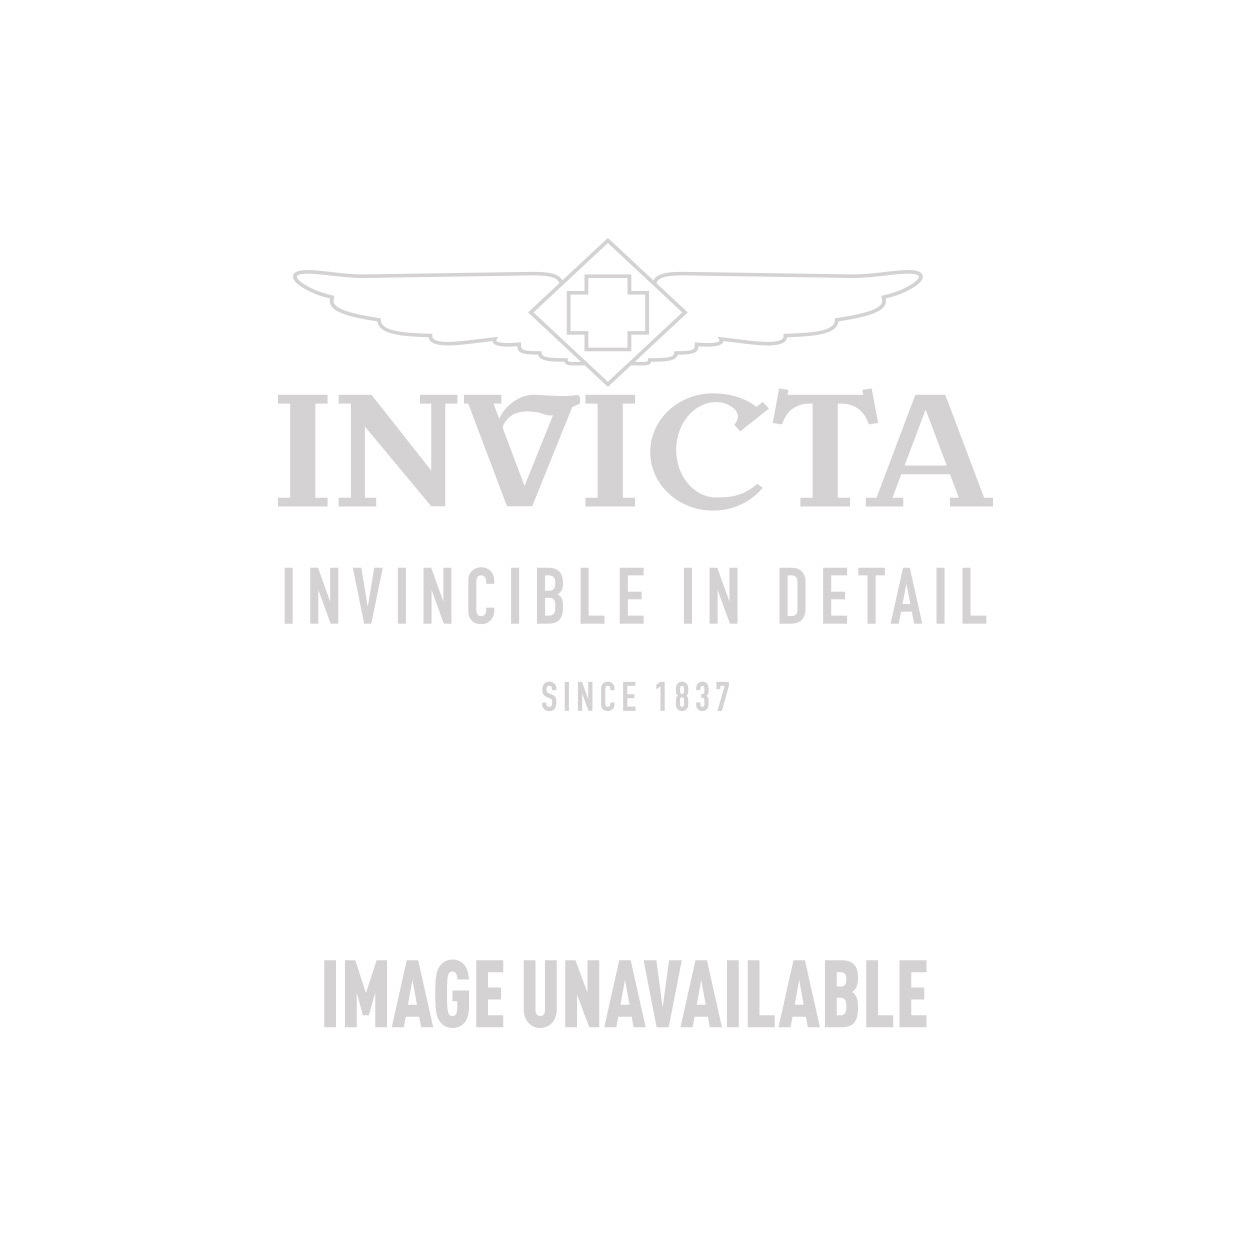 Invicta Pro Diver SCUBA Swiss Movement Quartz Watch - Black case with Black tone Stainless Steel, Polyurethane band - Model 6986